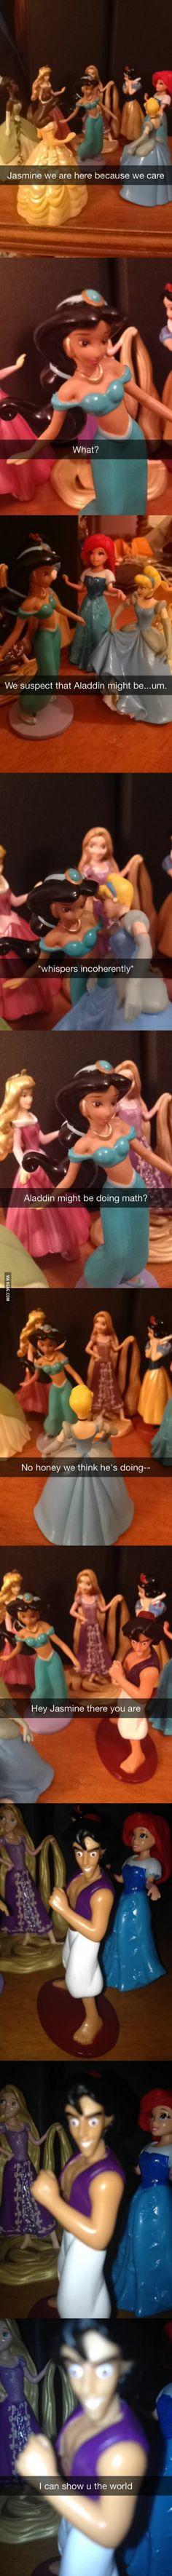 Jasmine, we suspect that Aladdin might be…